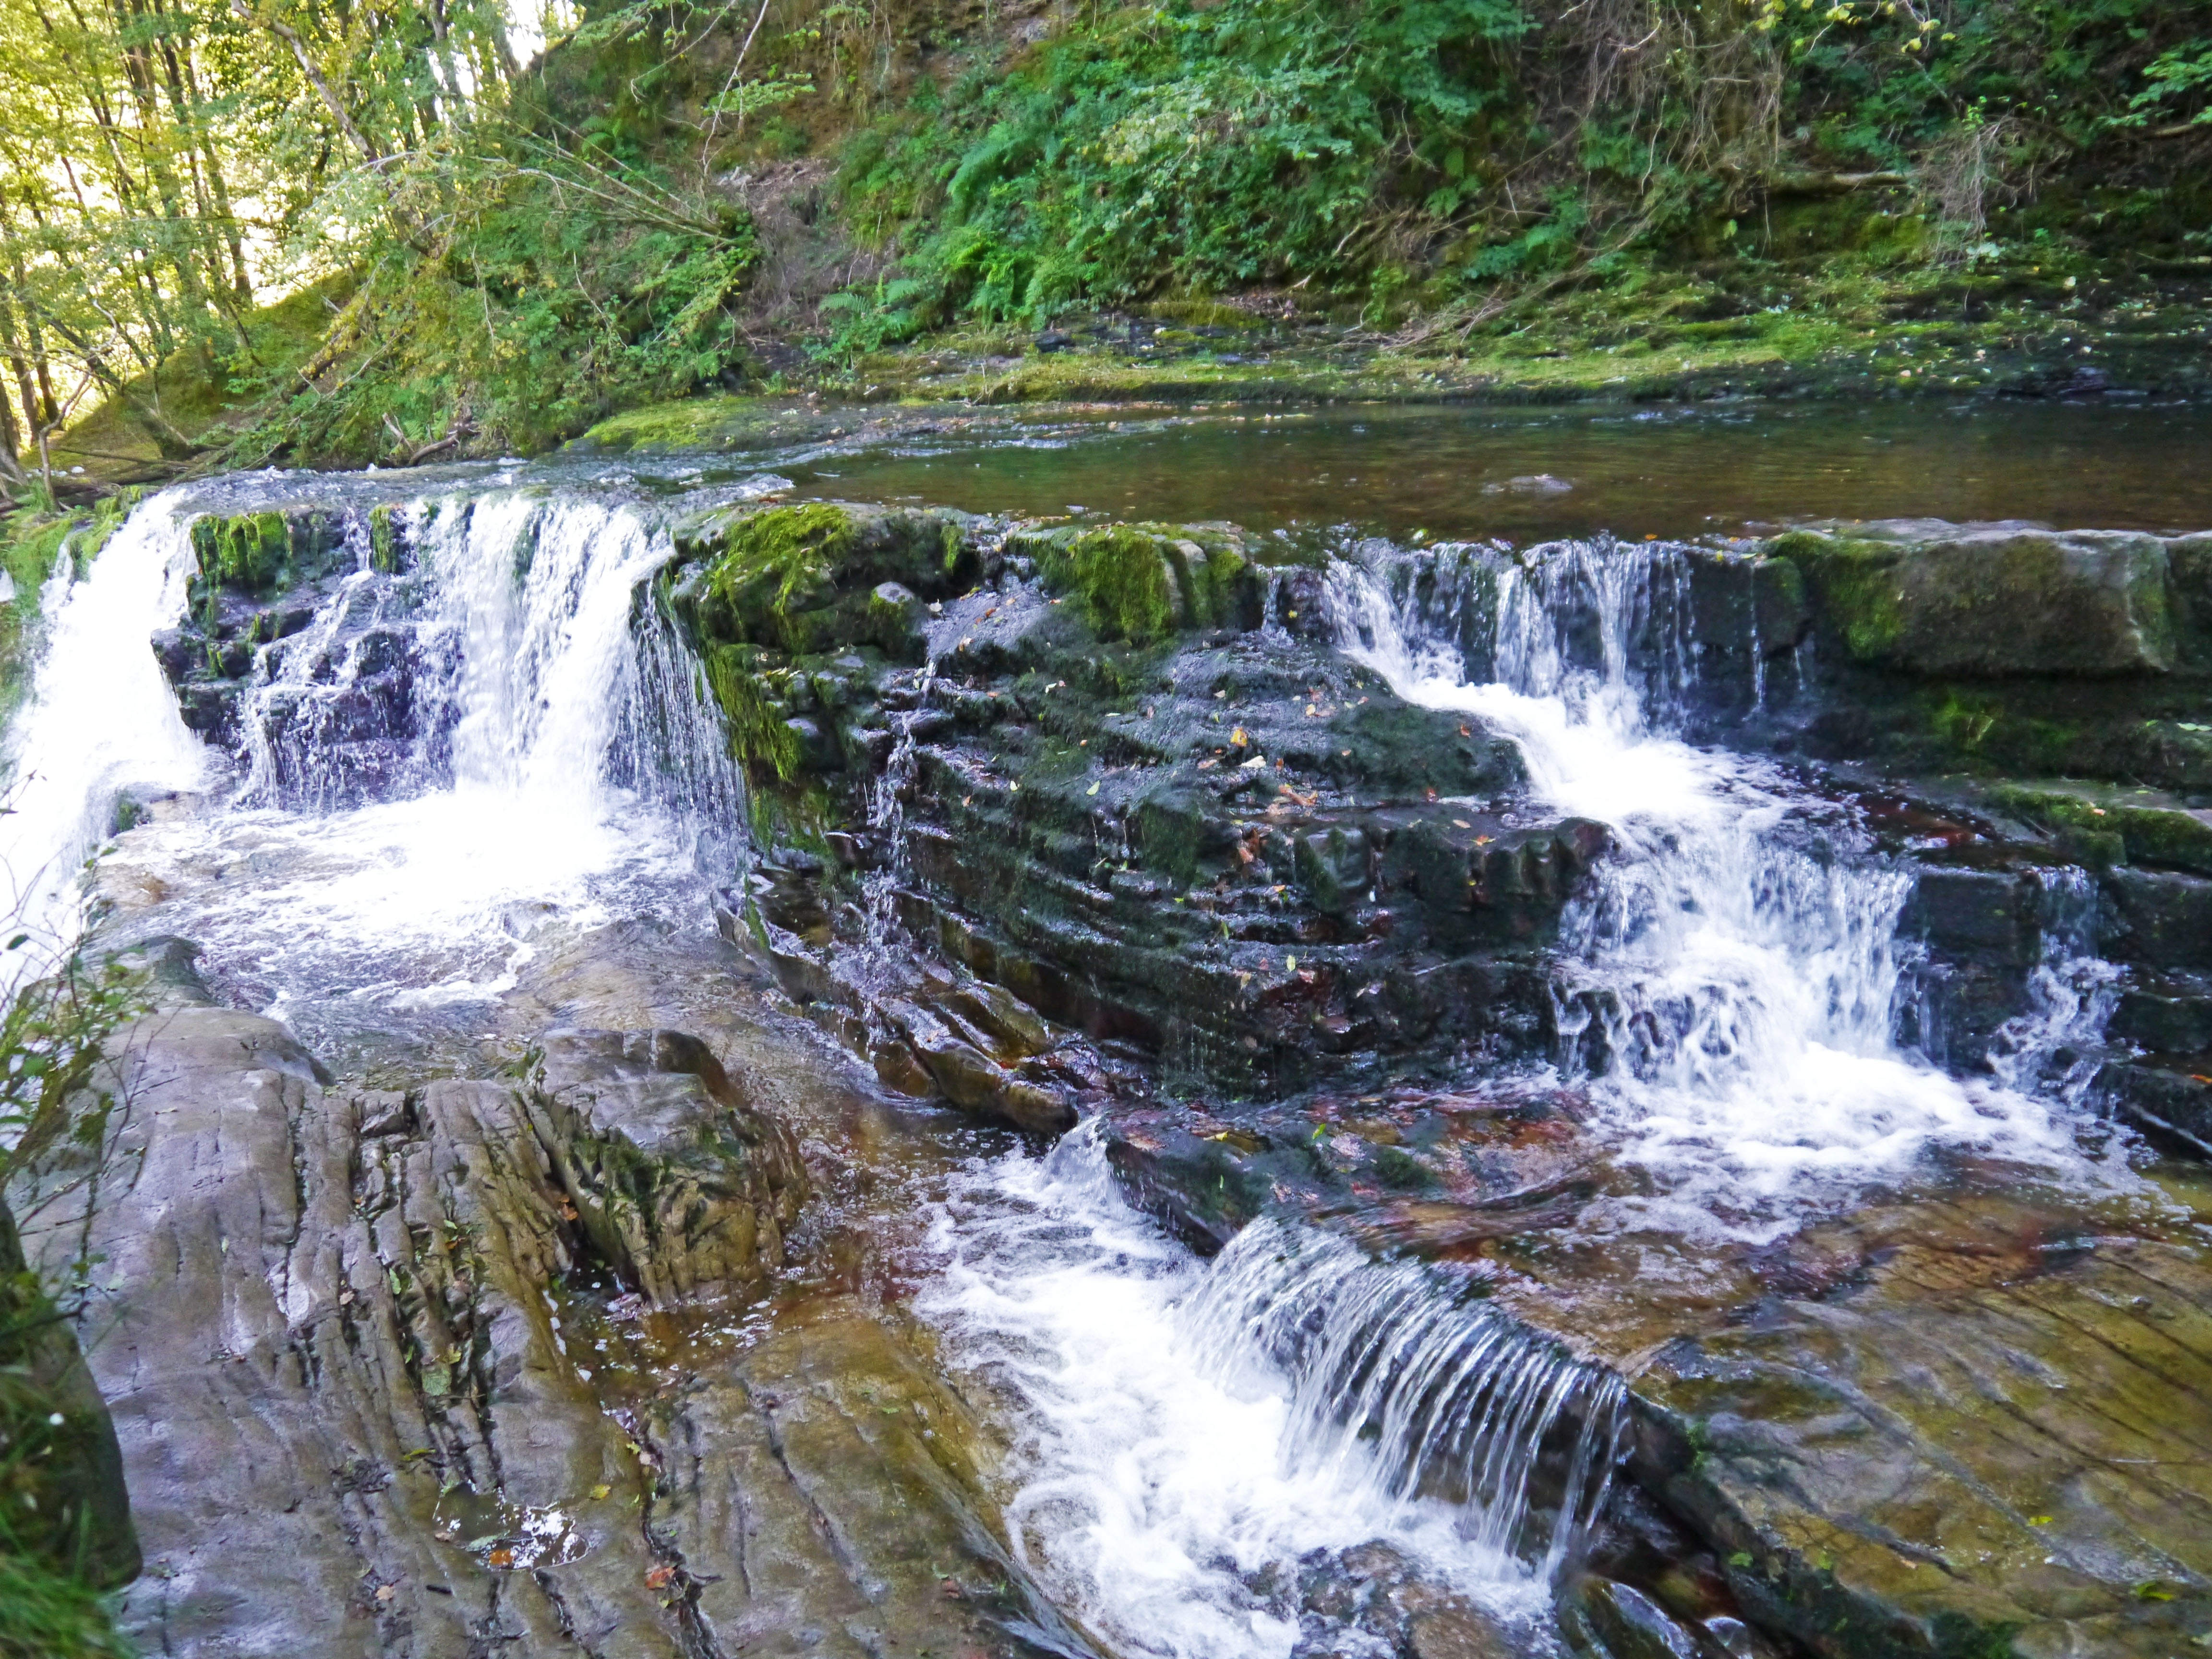 Waterfall at Ystradfellte